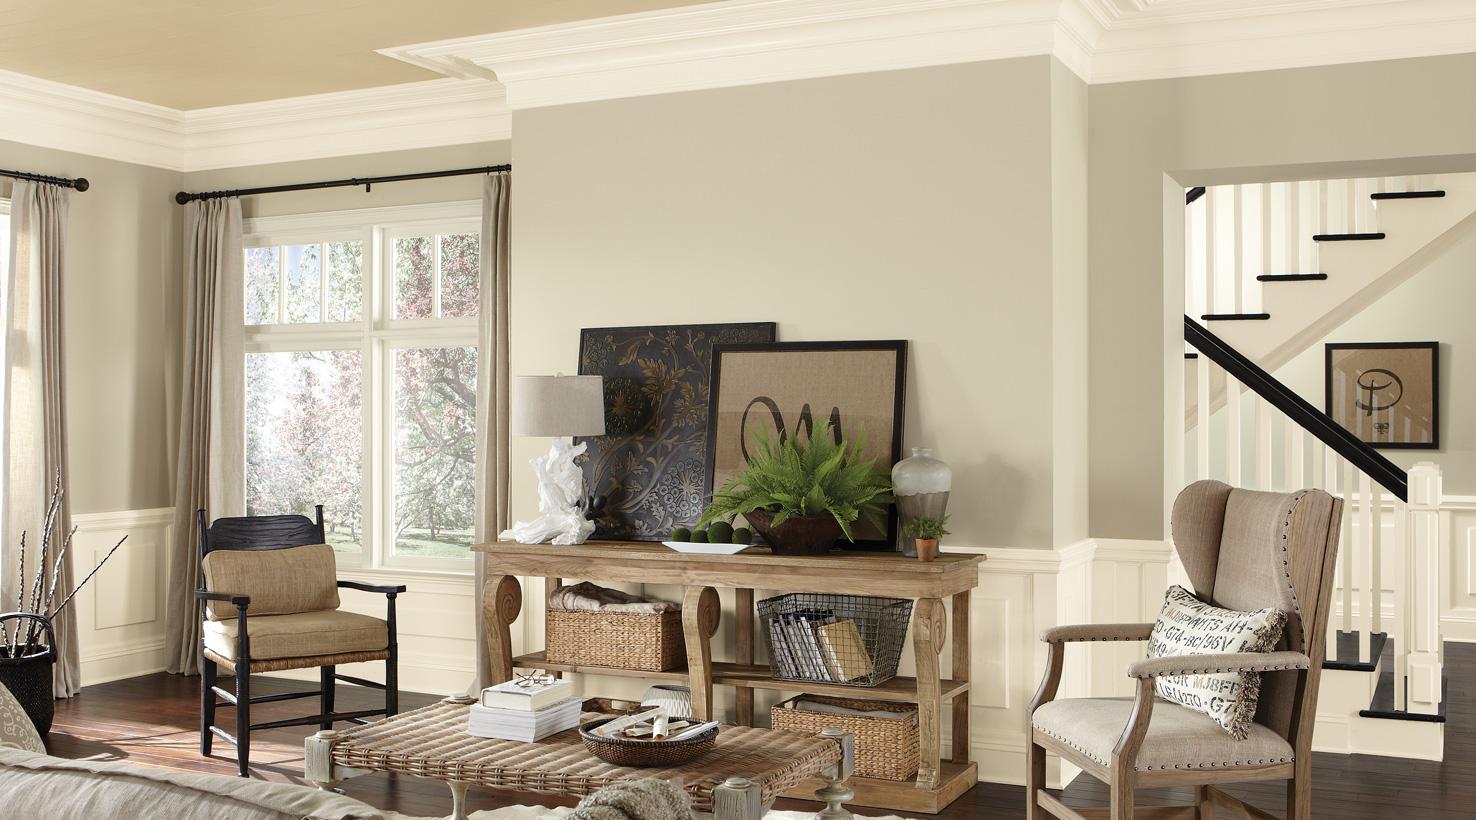 Living Room Painting Colors Ideas - Deplok Painting